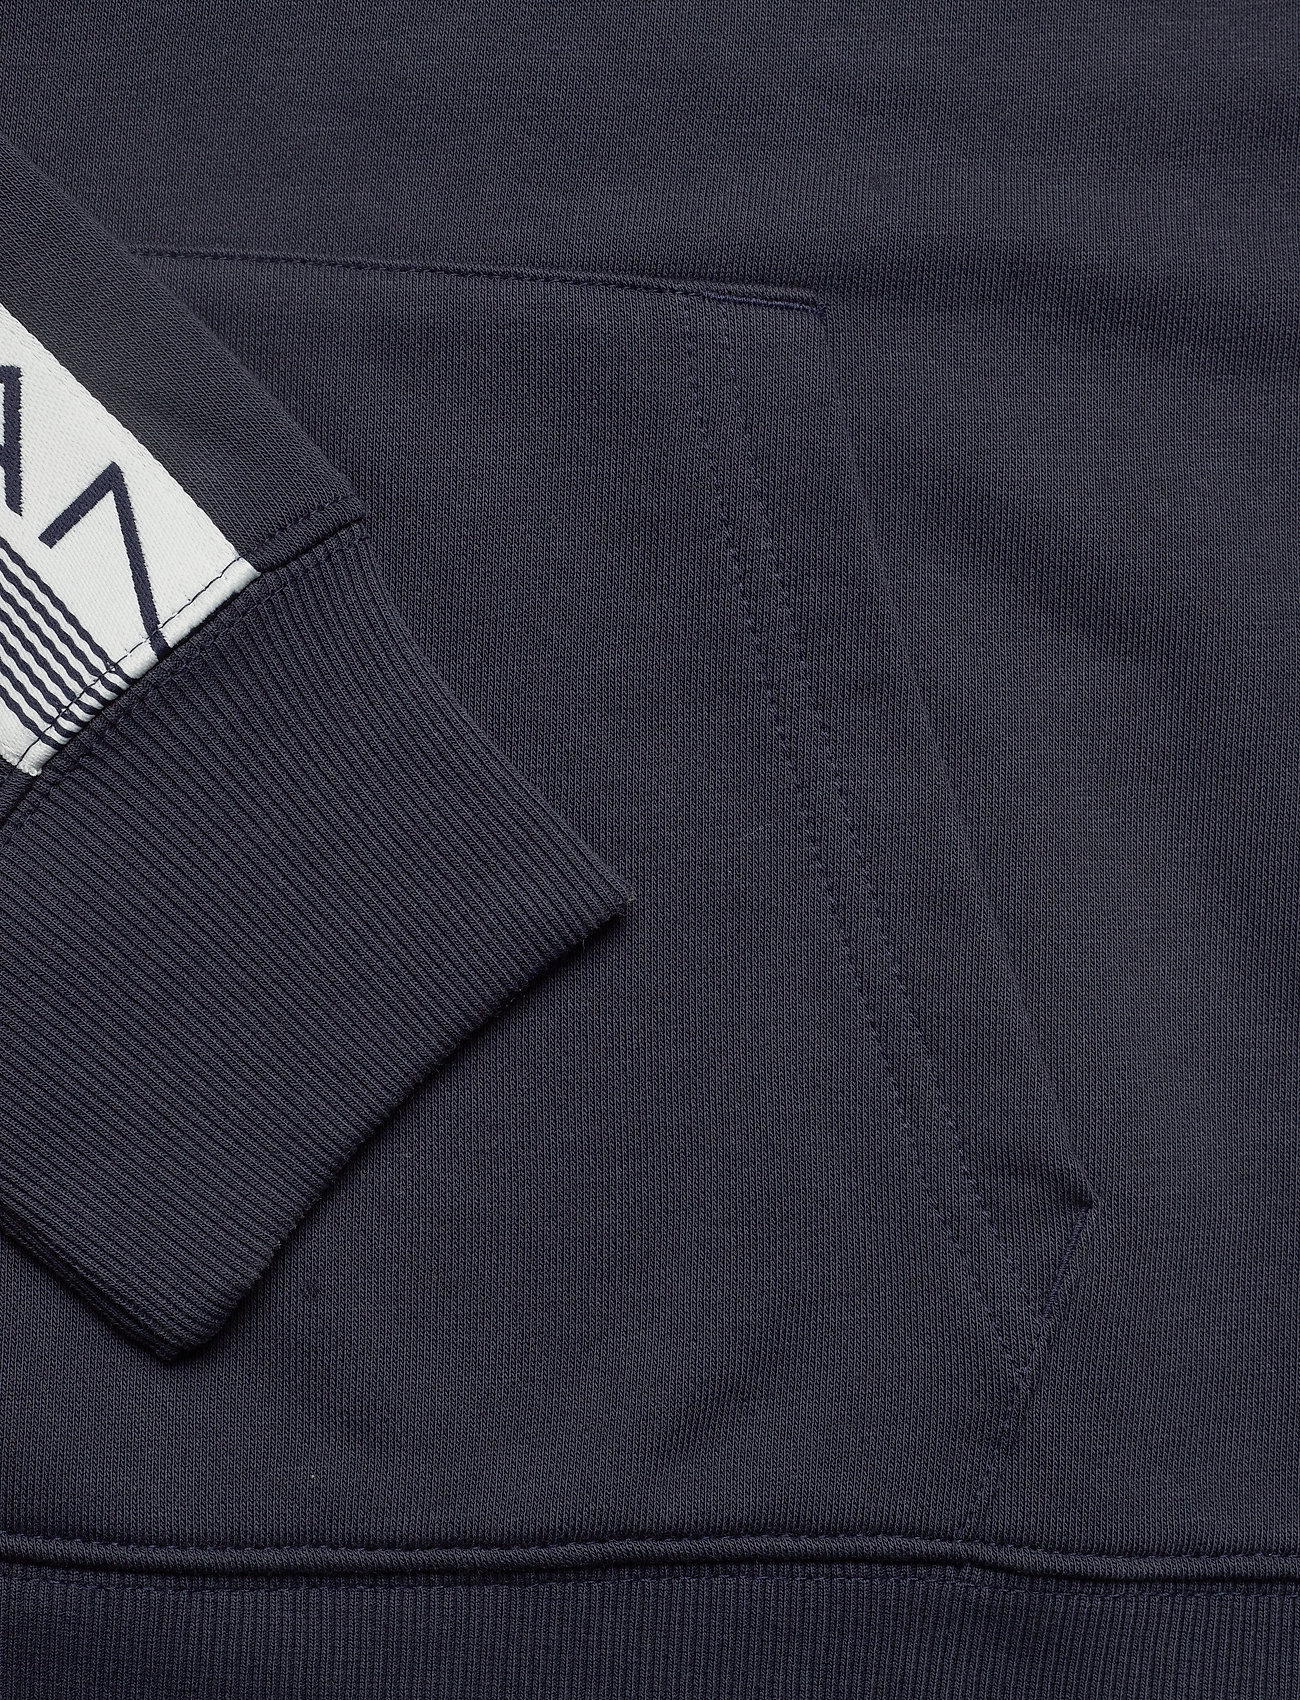 GANT D1. 13 STRIPES SWEAT HOODIE - Sweatshirts EVENING BLUE - Menn Klær